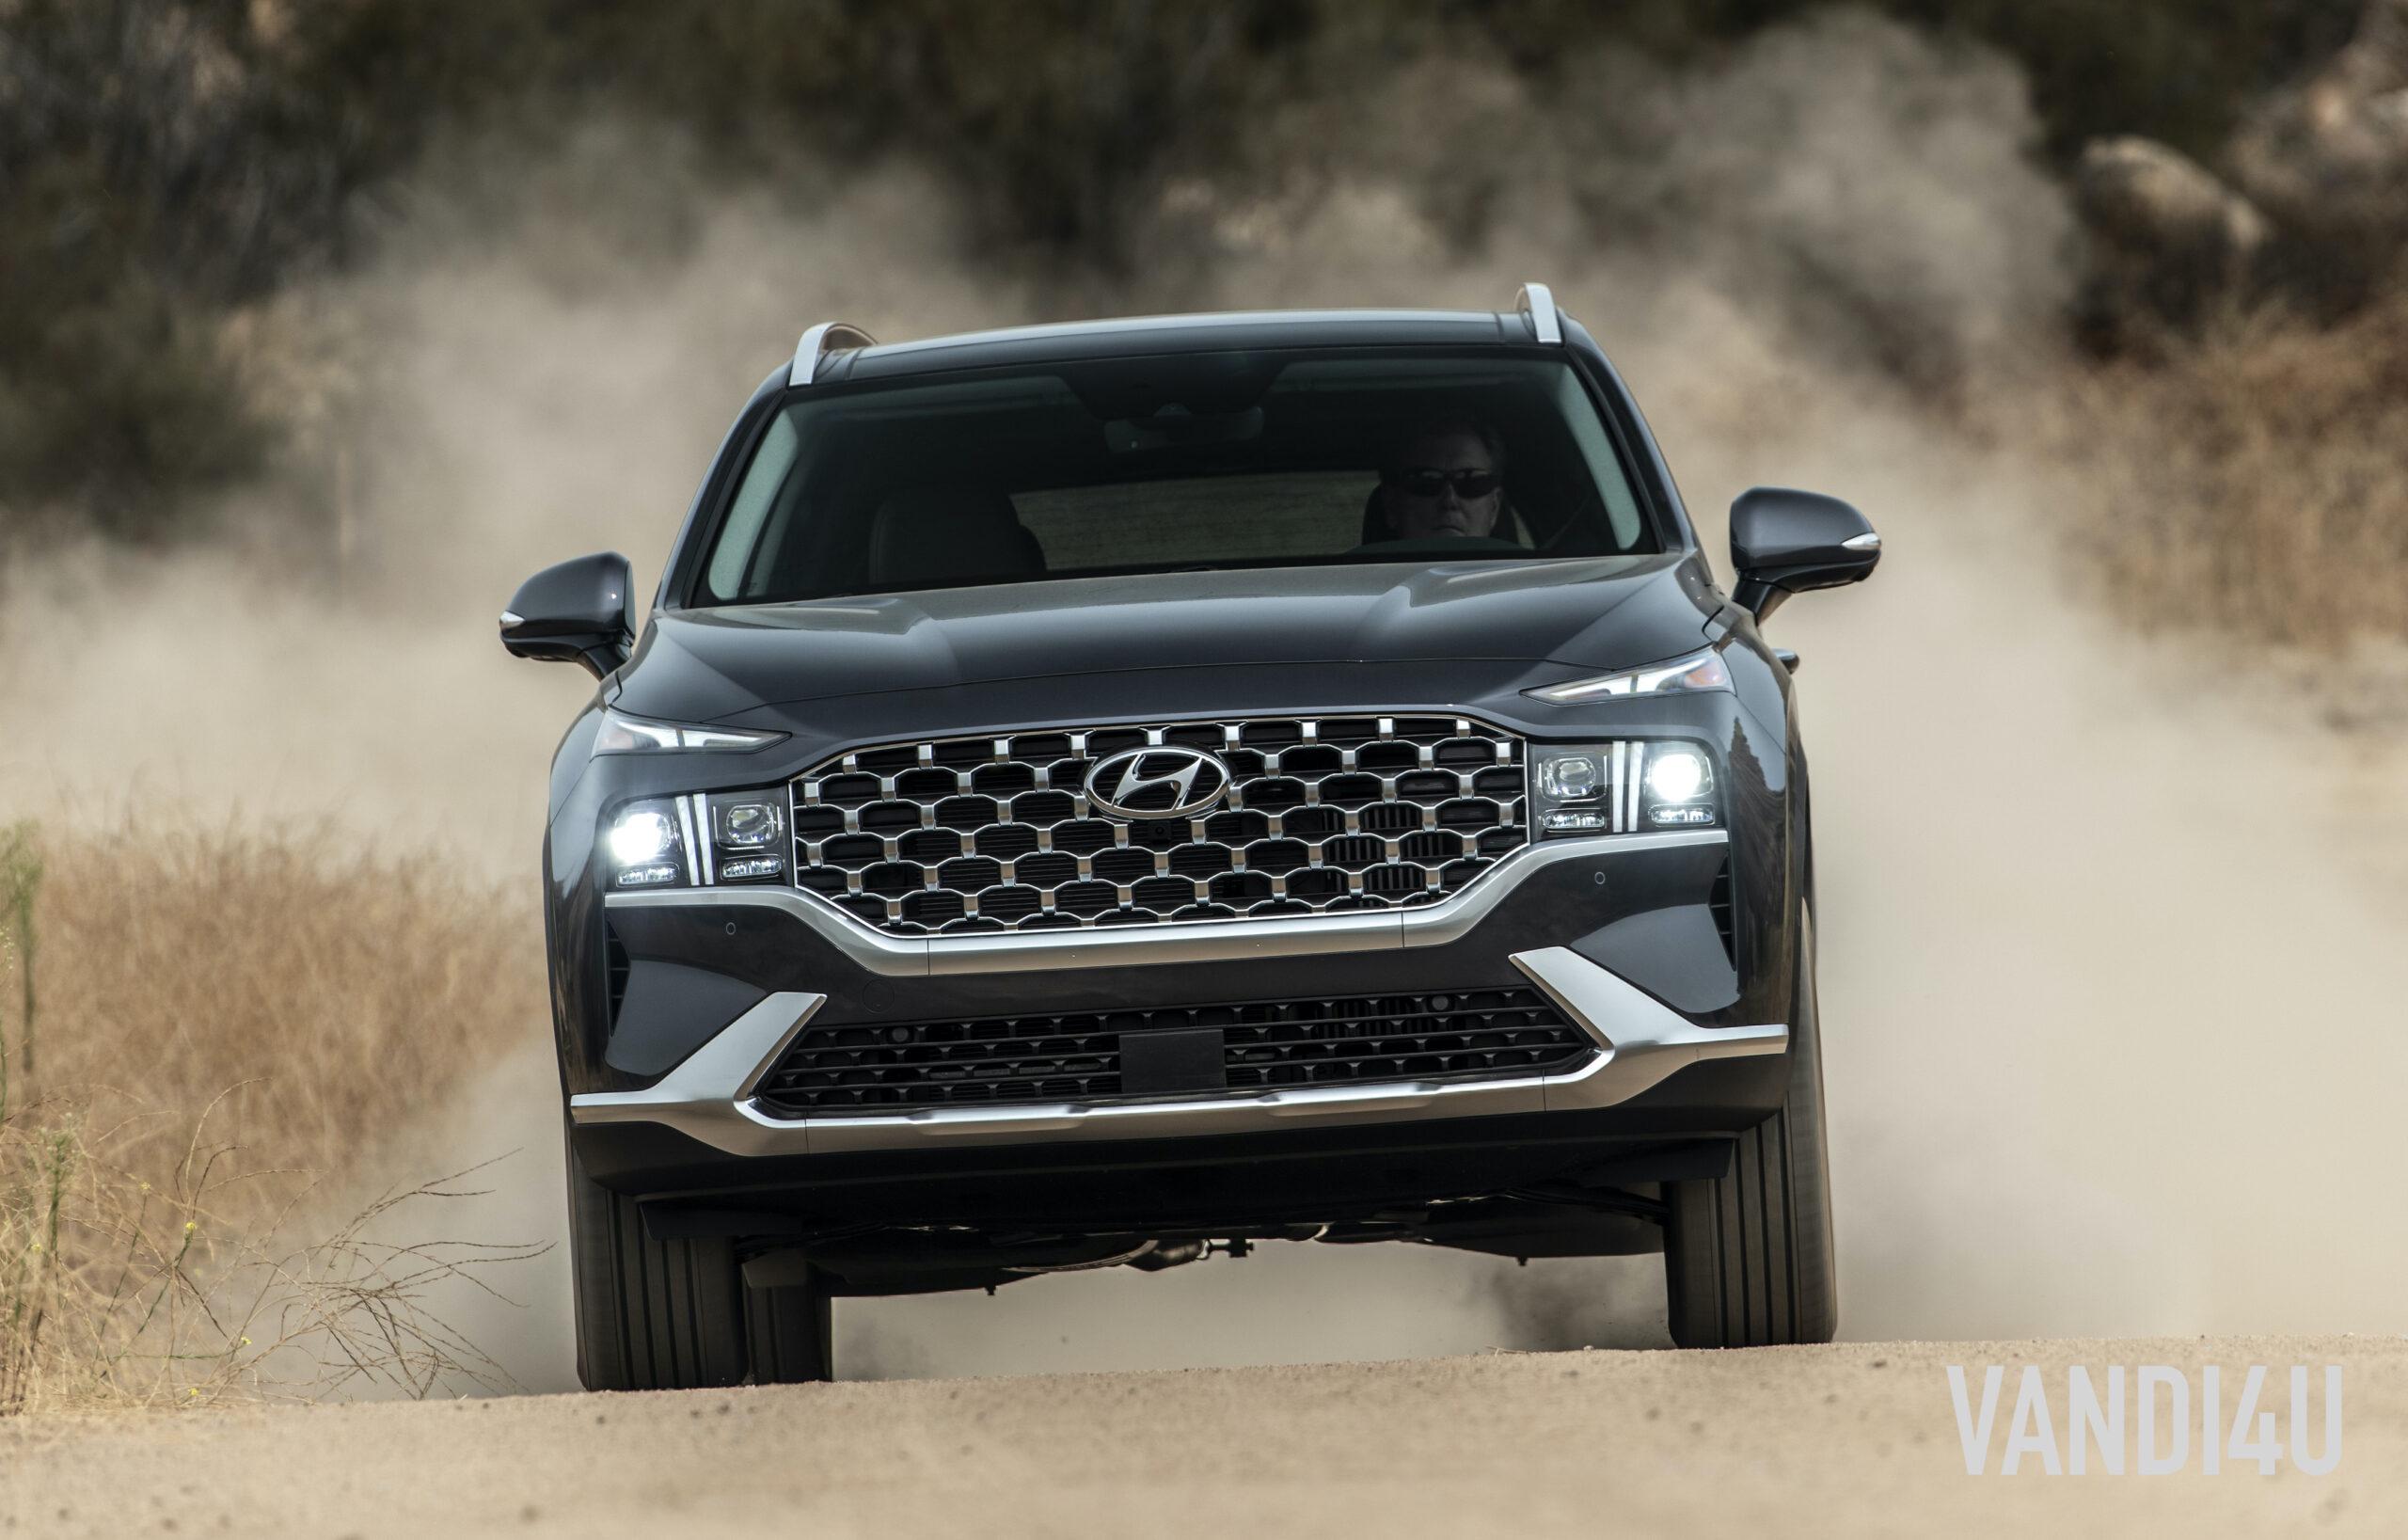 2021 Hyundai Santa Fe: Top 16 things to know | Vandi4u